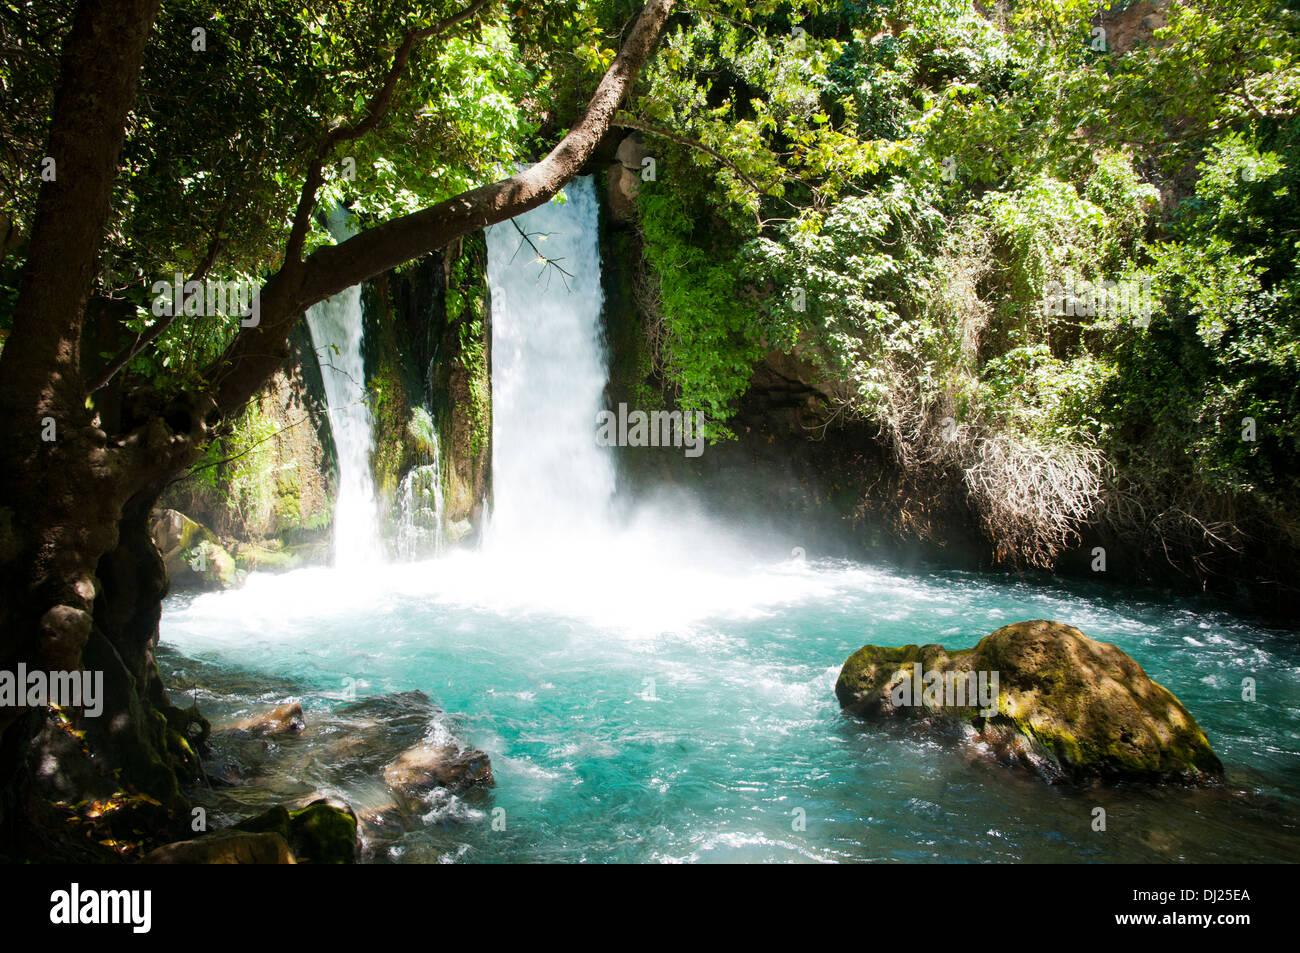 Hermon Stream Nature Reserve Banias Golan Heights Israel This Stock Photo